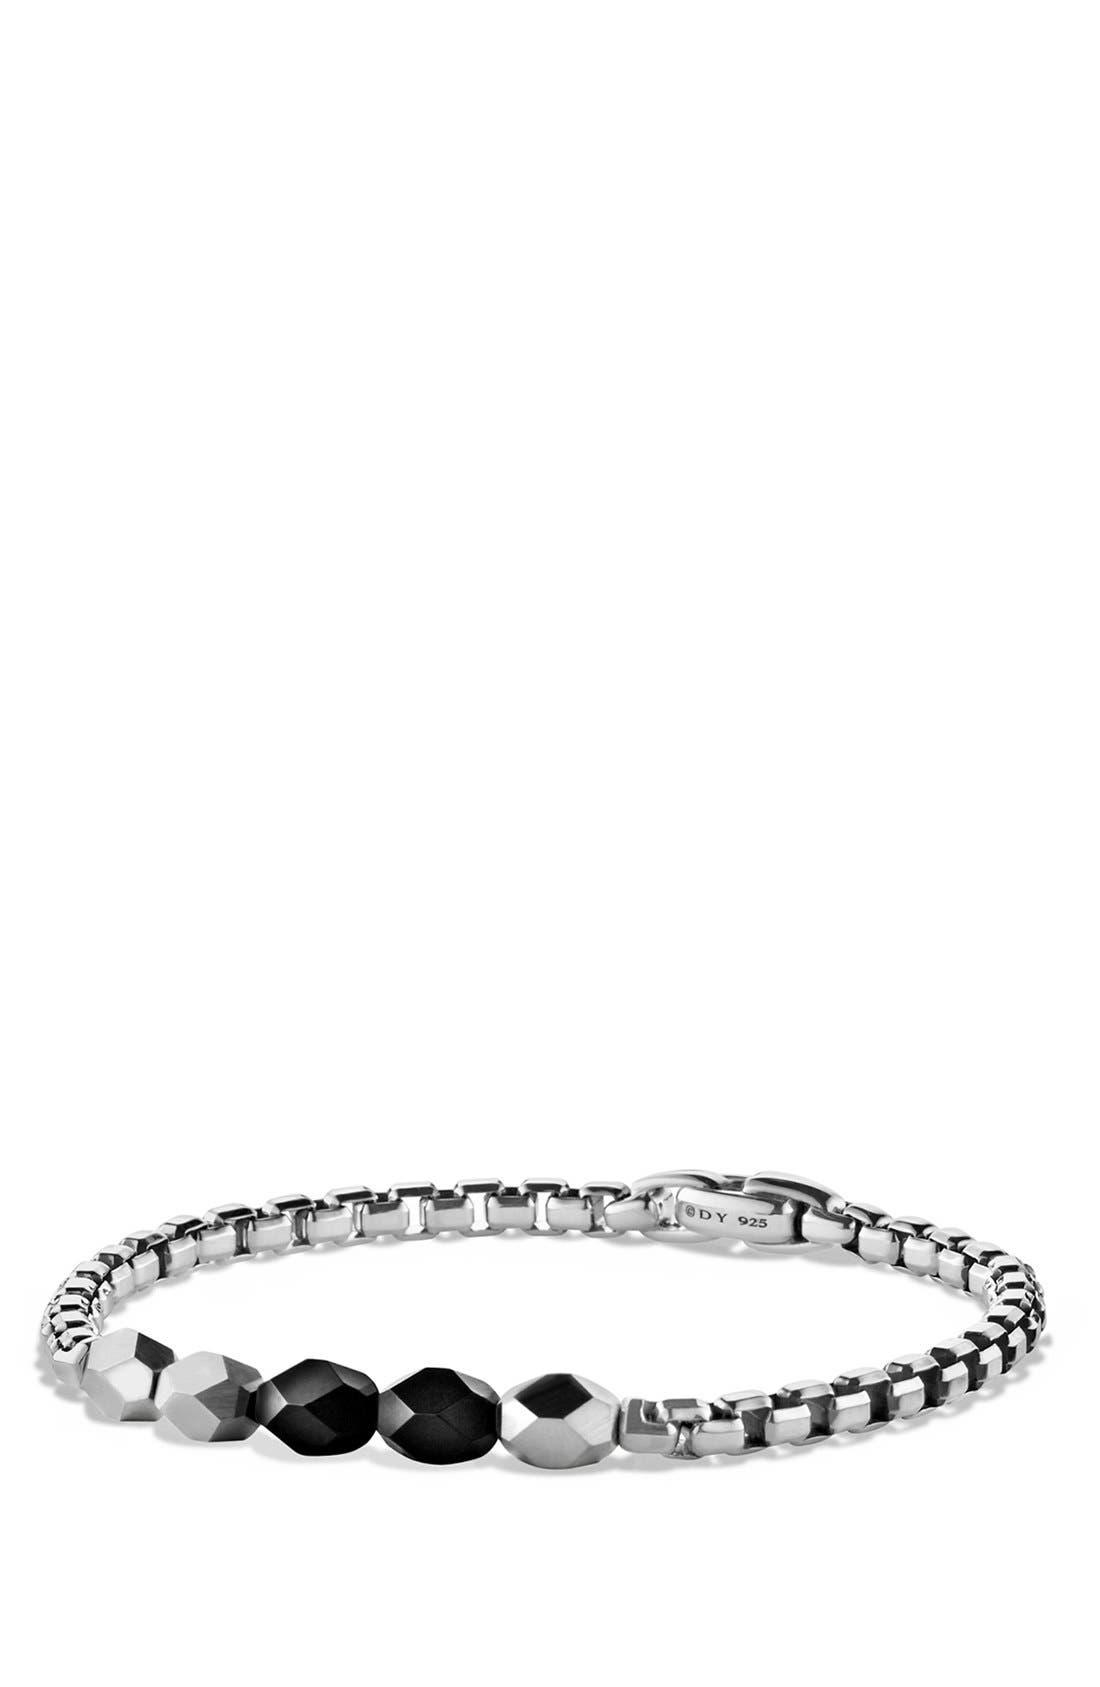 David Yurman 'Faceted' Metal Bracelet